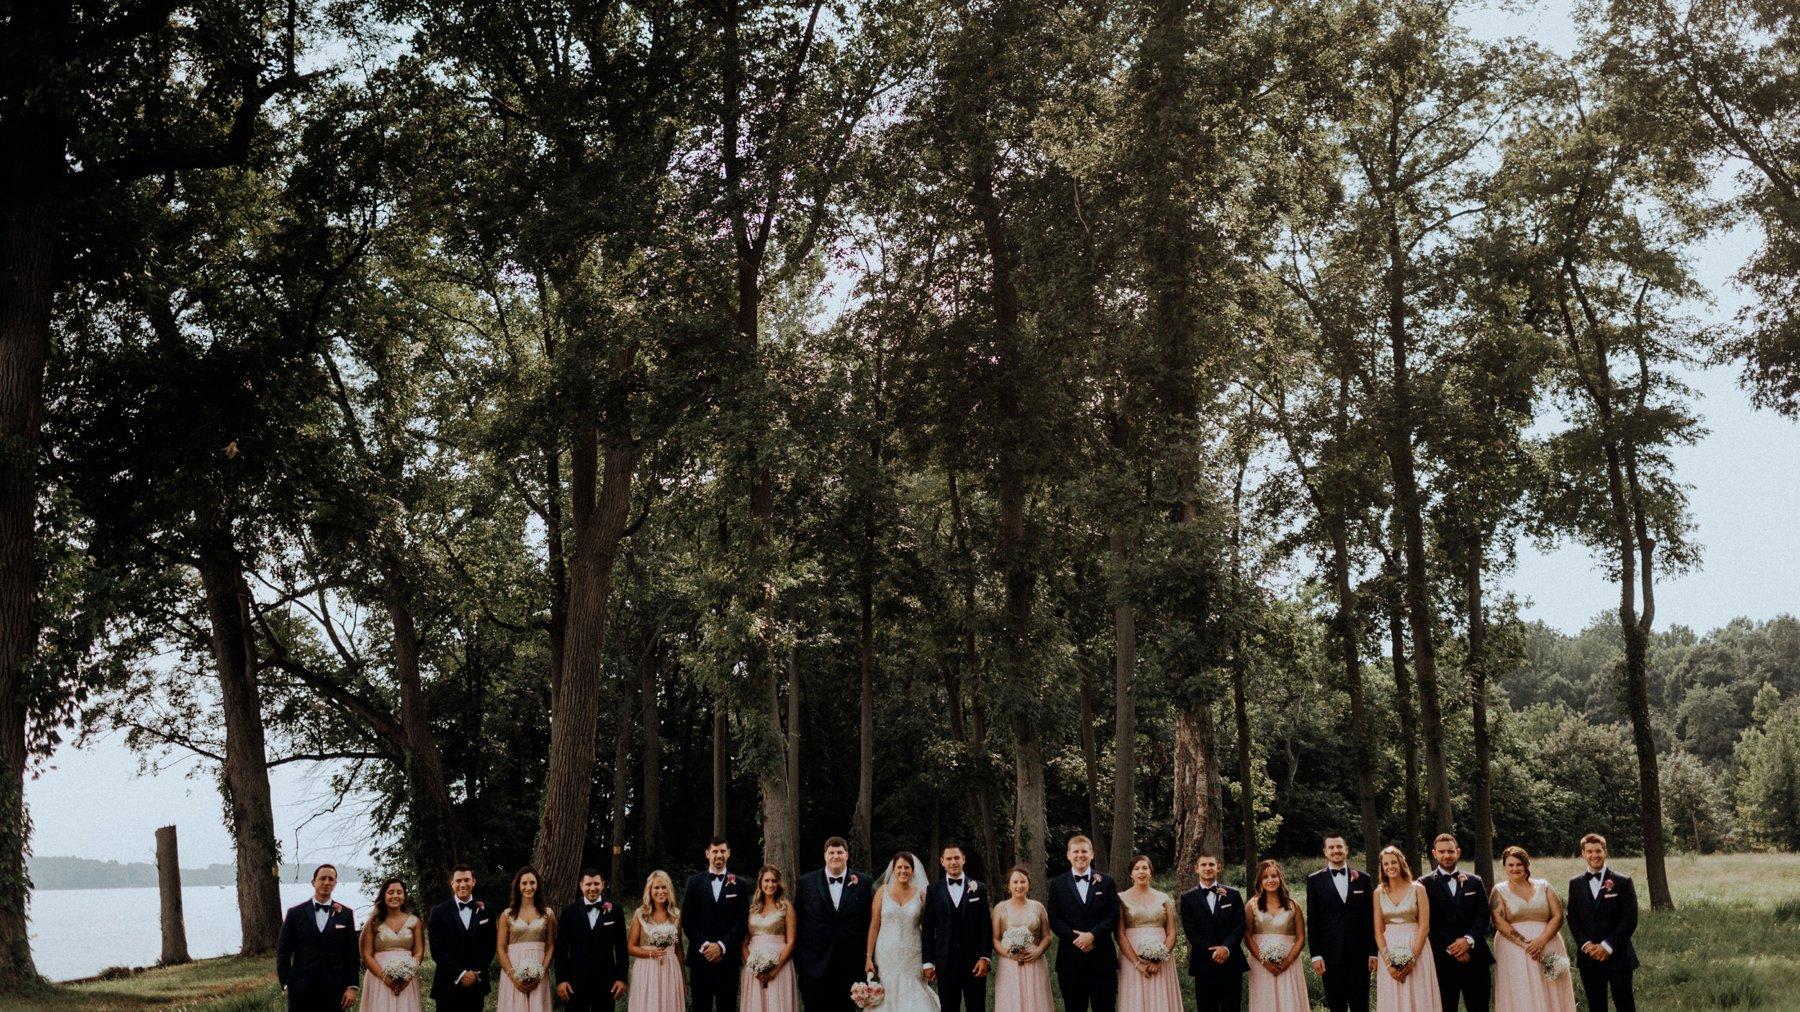 005-004-pen-ryn-wedding-4.jpg